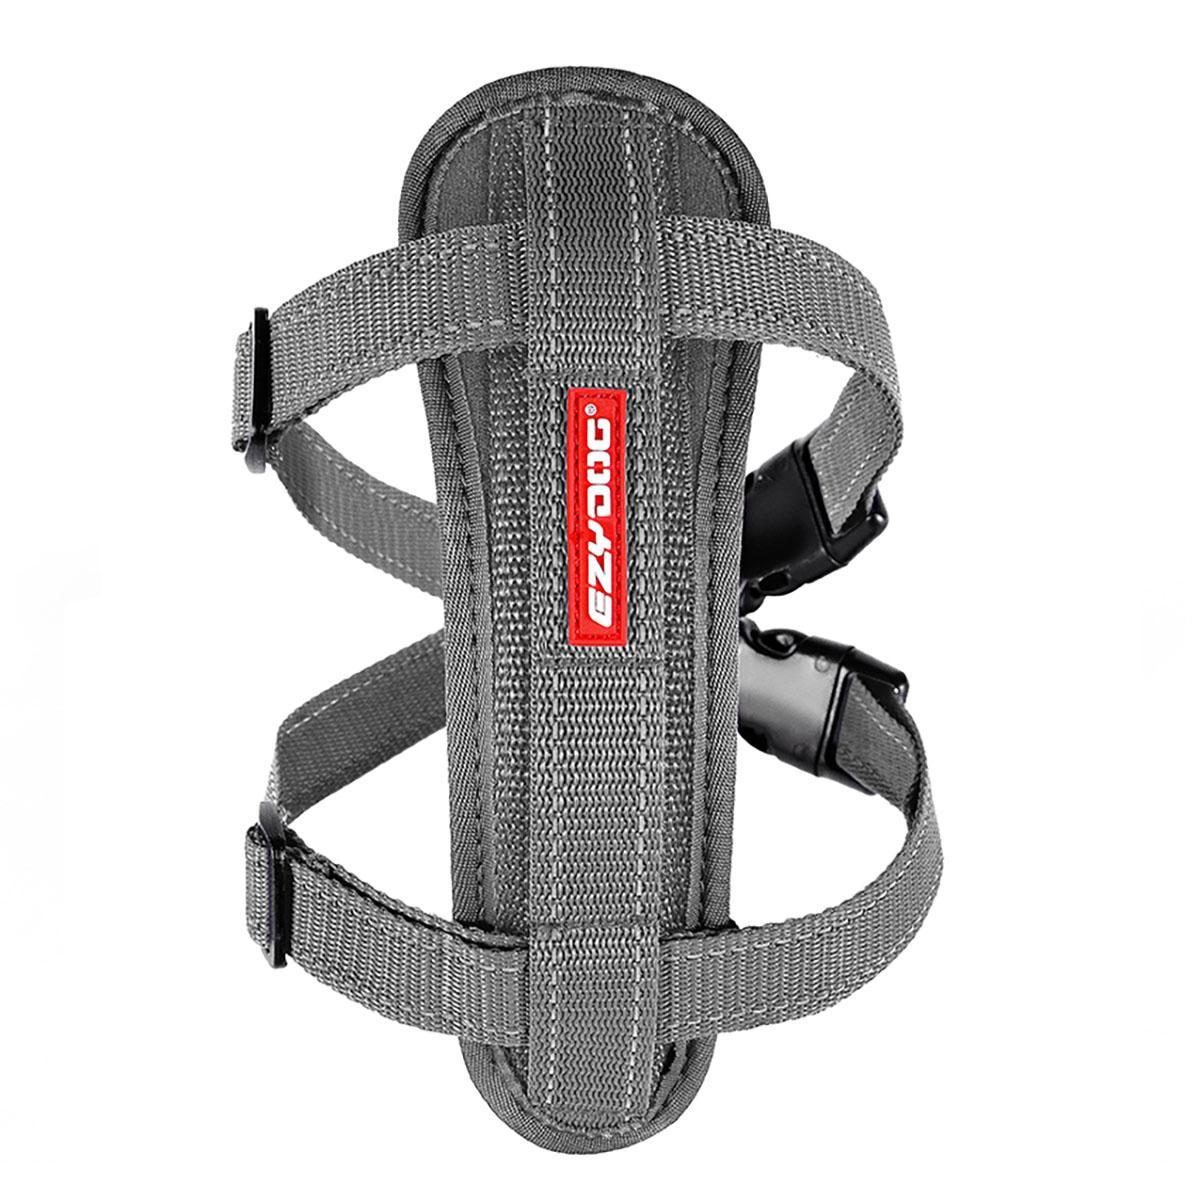 EzyDog Chest Plate Dog Harness - Gray